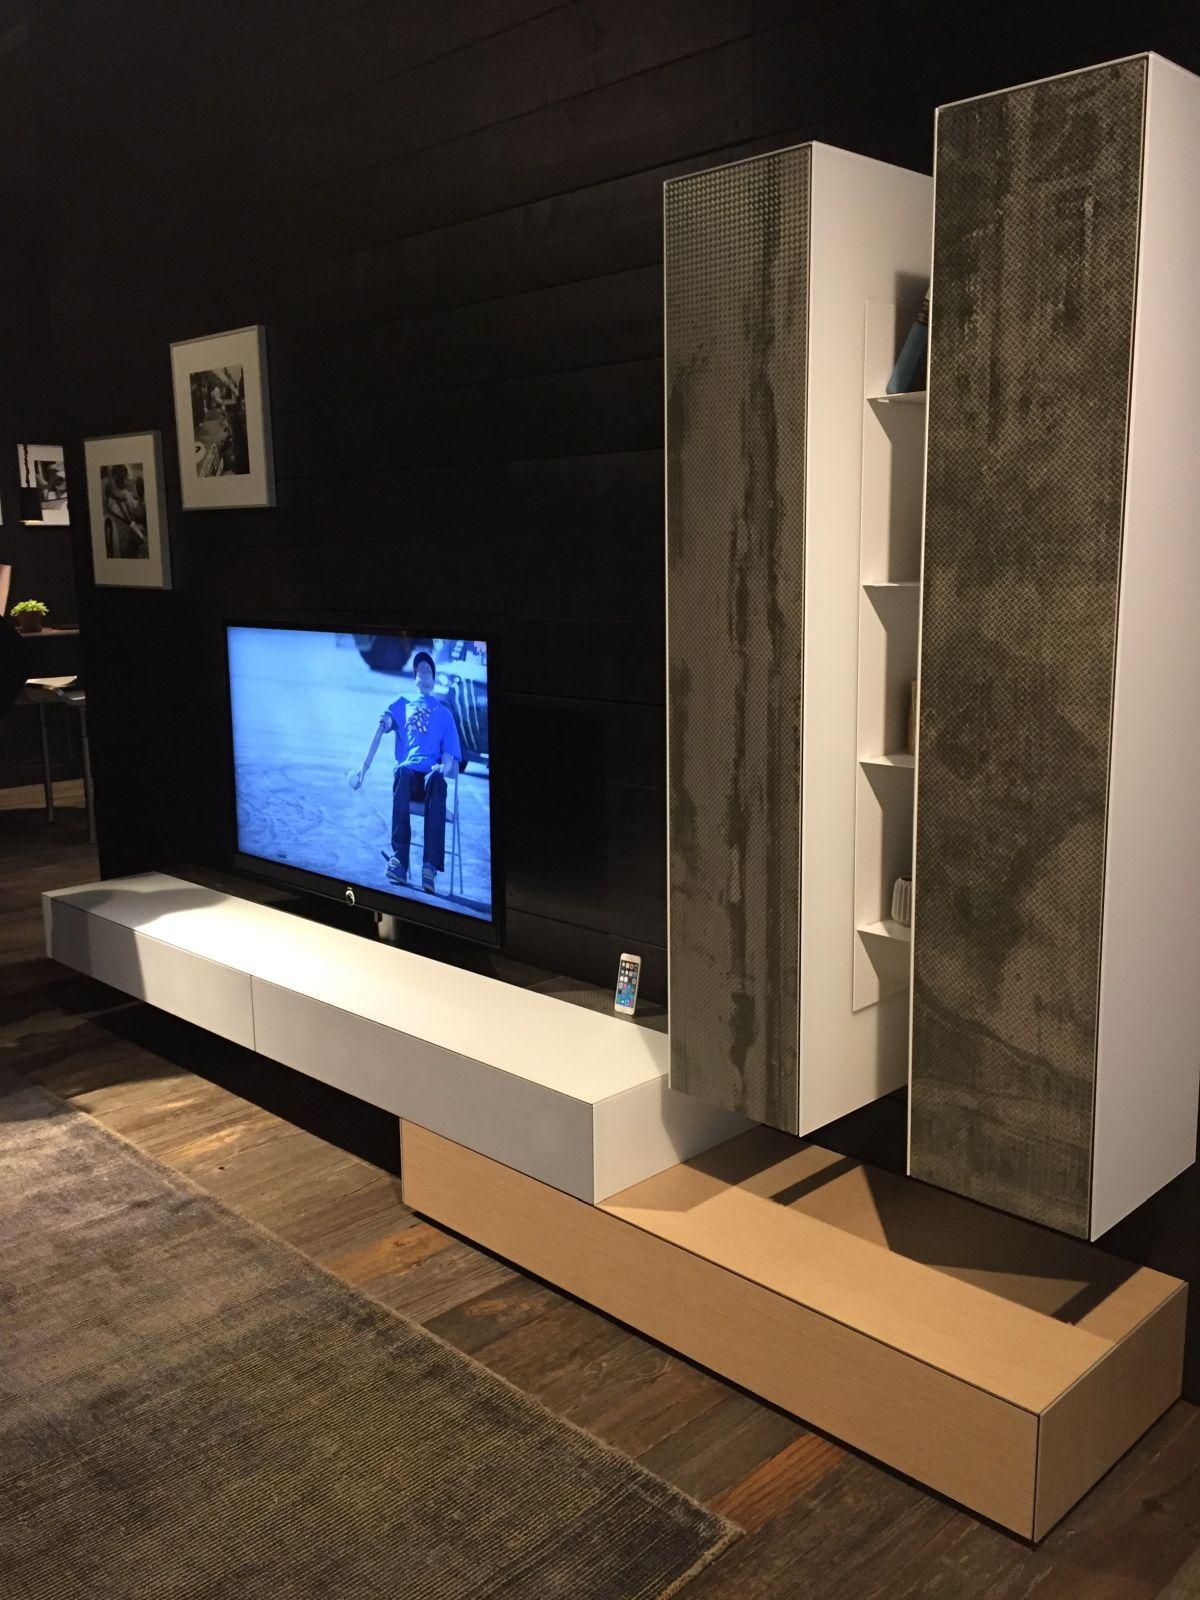 White and cream tv console with concrete accents